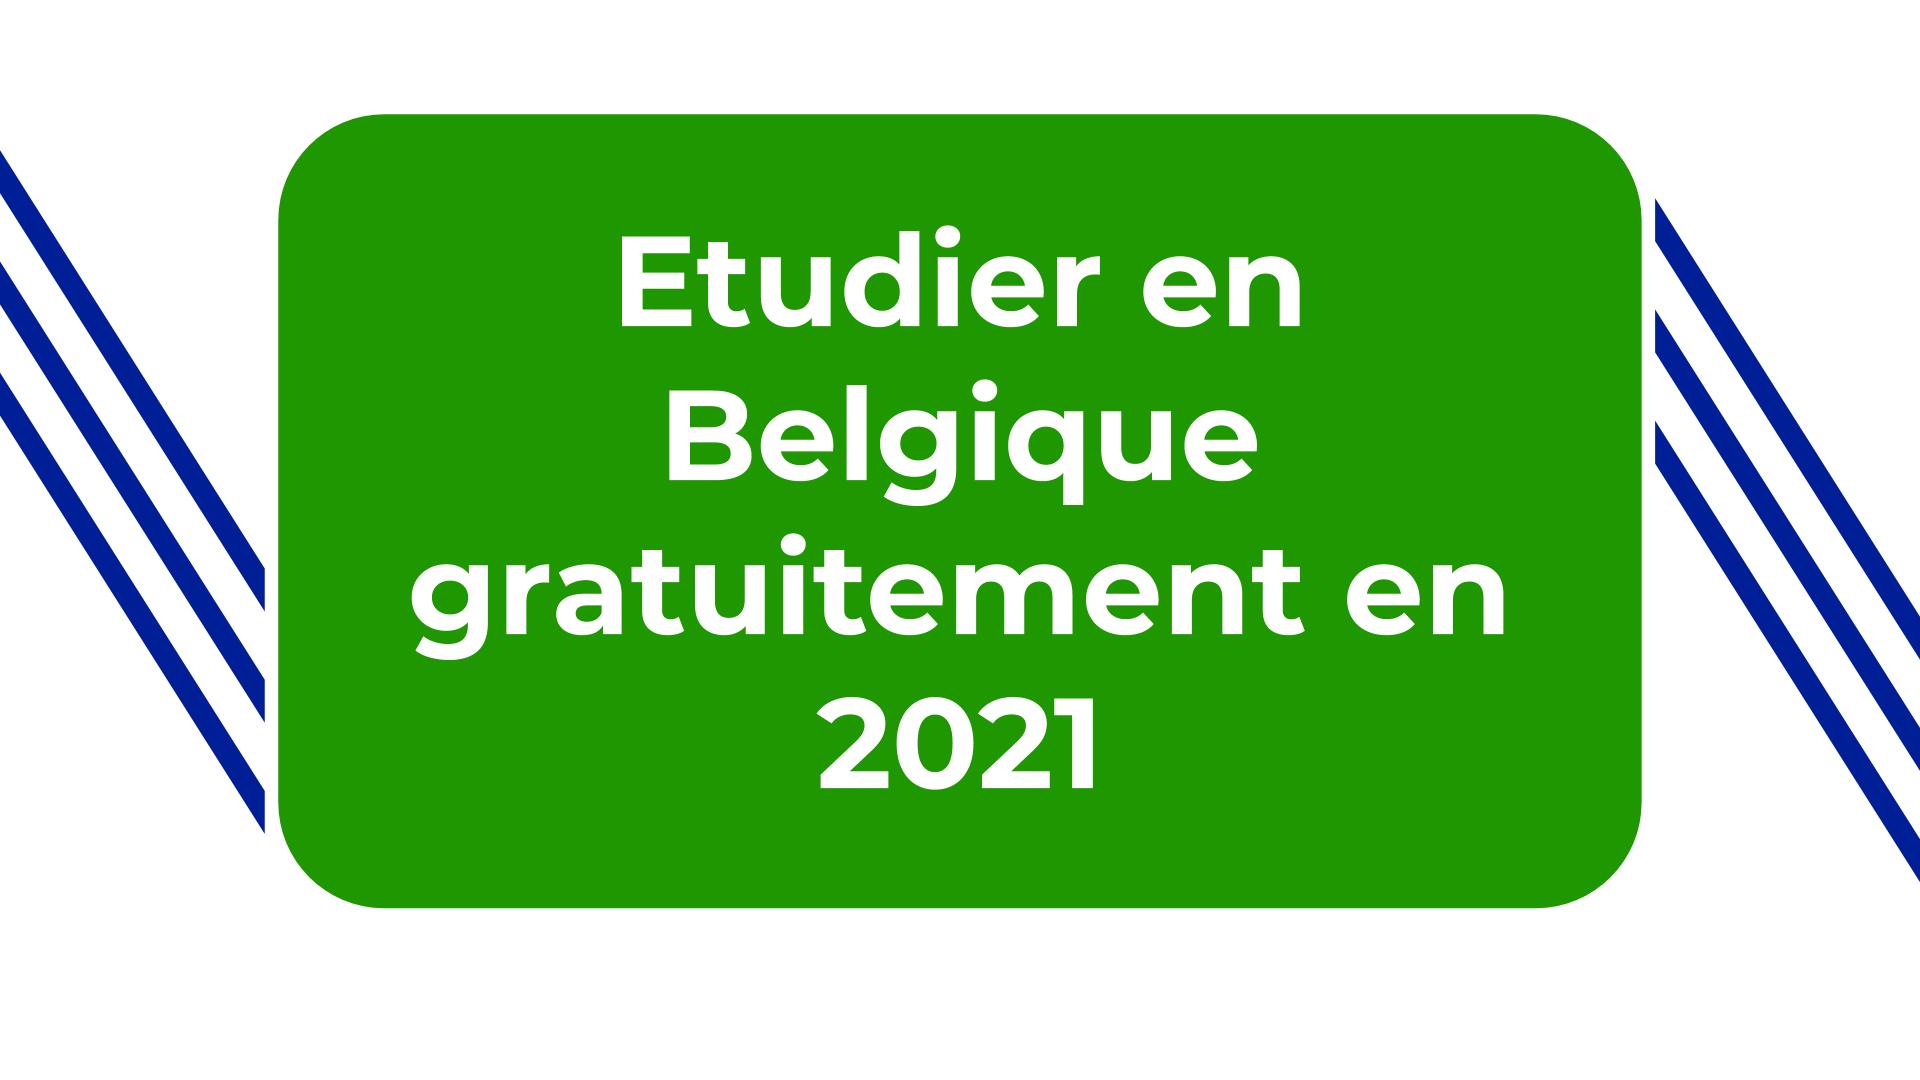 Etudier en Belgique gratuitement